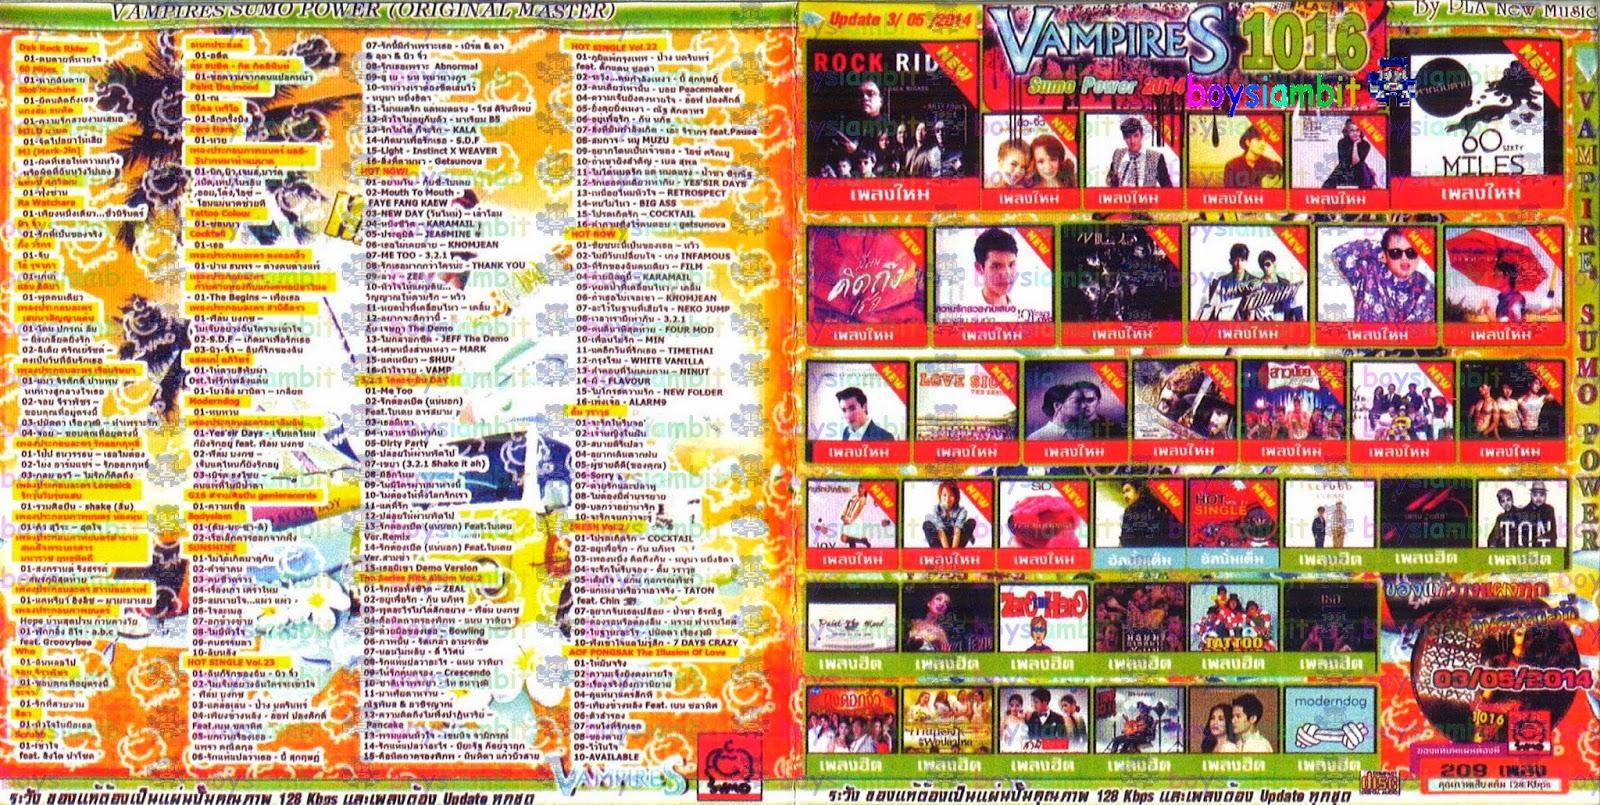 Download [Mp3]-[Hot New!!] ใหม่เพลงอัพเดท ชุด Vampires Sumo Power 2014 Vol.1016 ออกวันที่ 3 มิถุนายน 2557 [Shared] 4shared By Pleng-mun.com